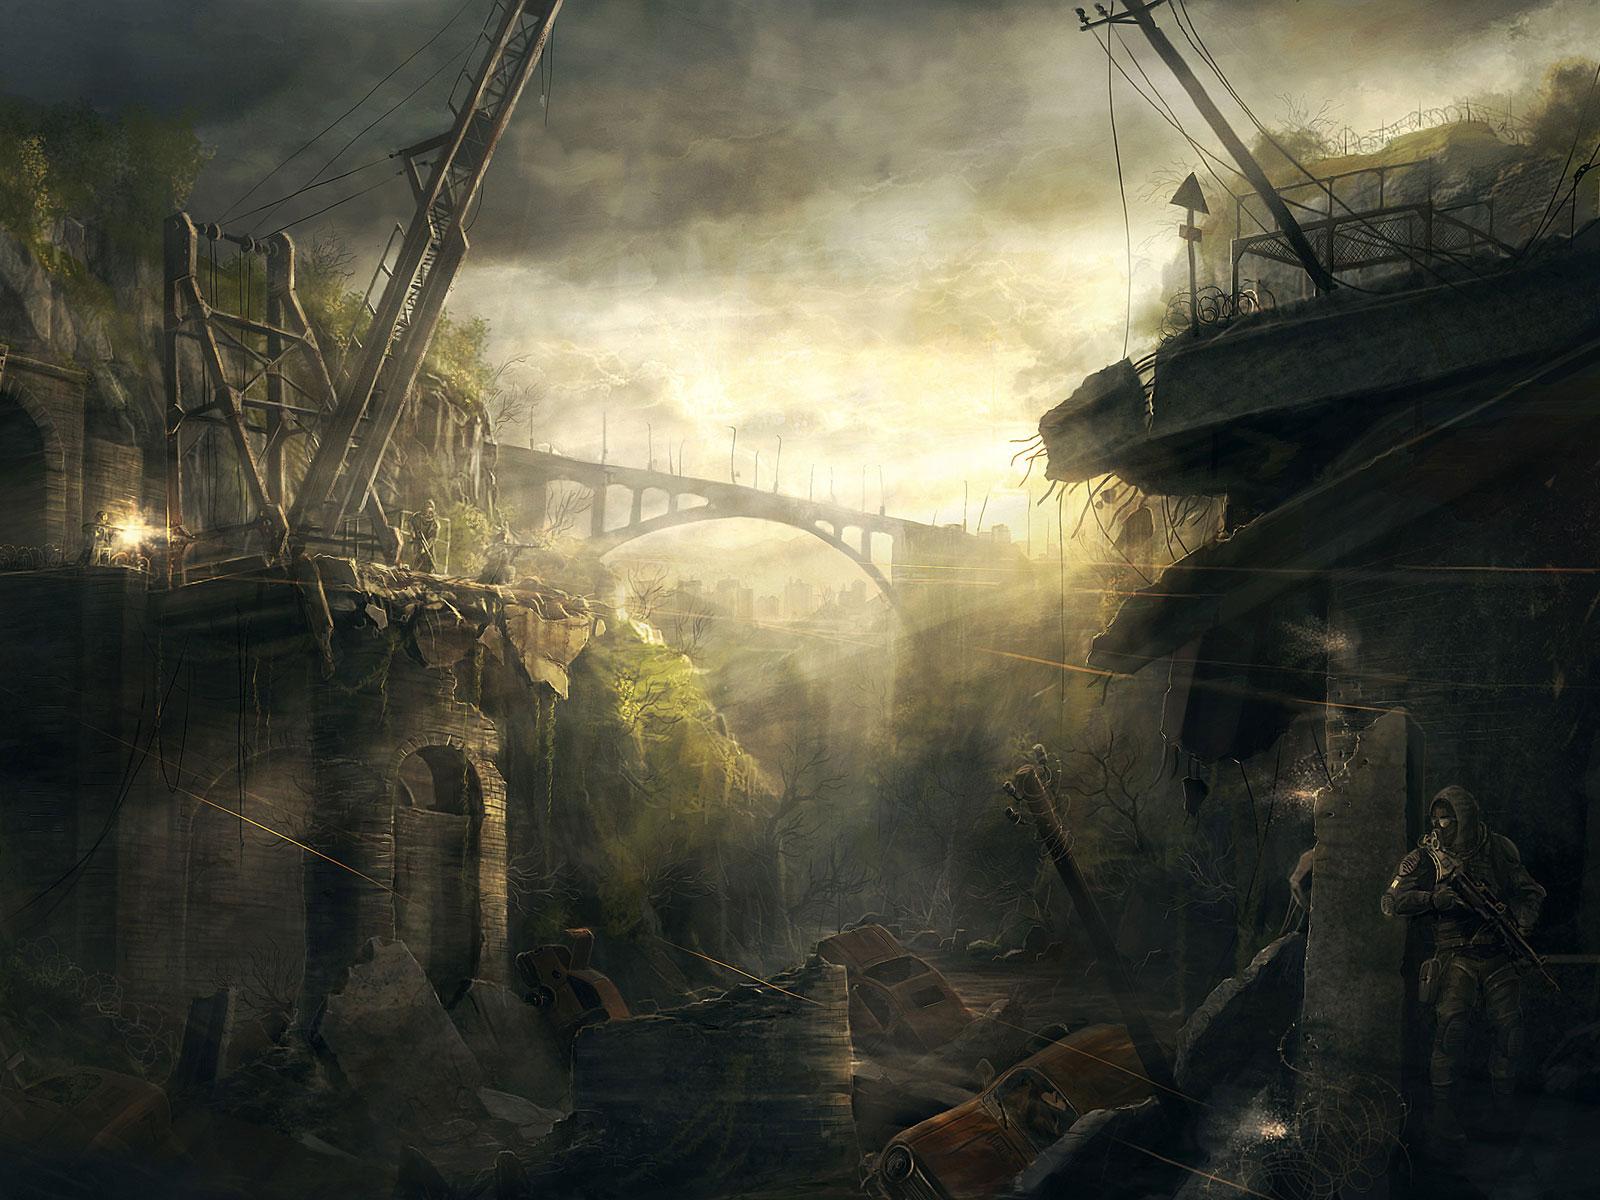 Post-Apocalyptic-Wallpaper-171